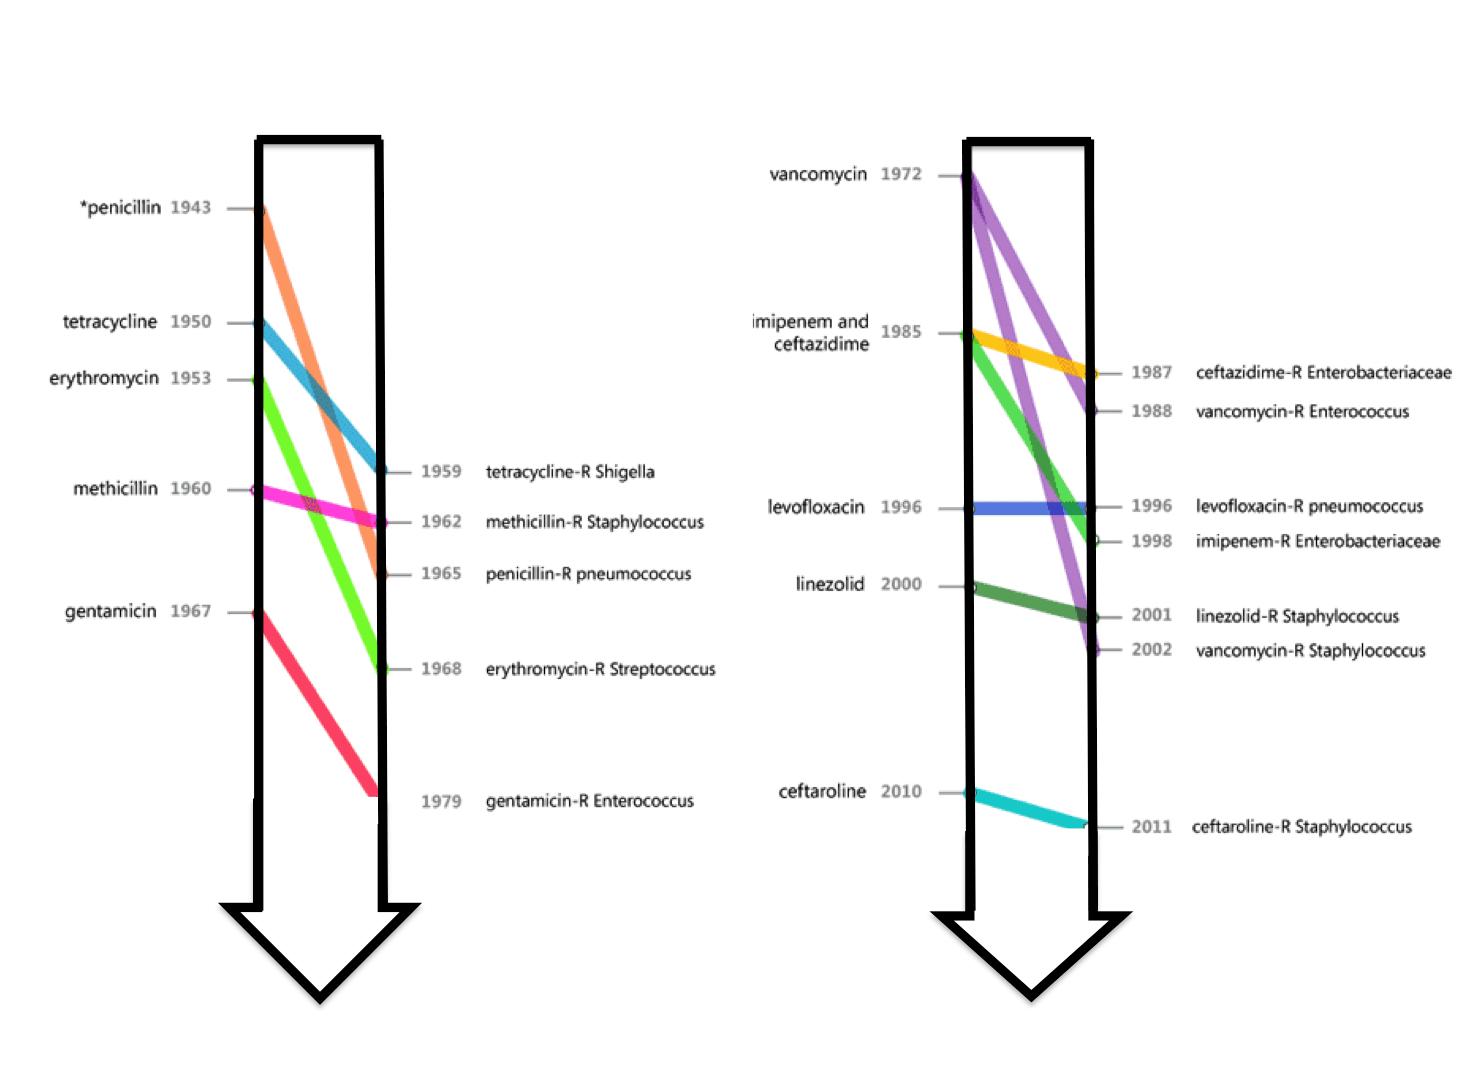 bacteria_antibiotic_resistance_timeline